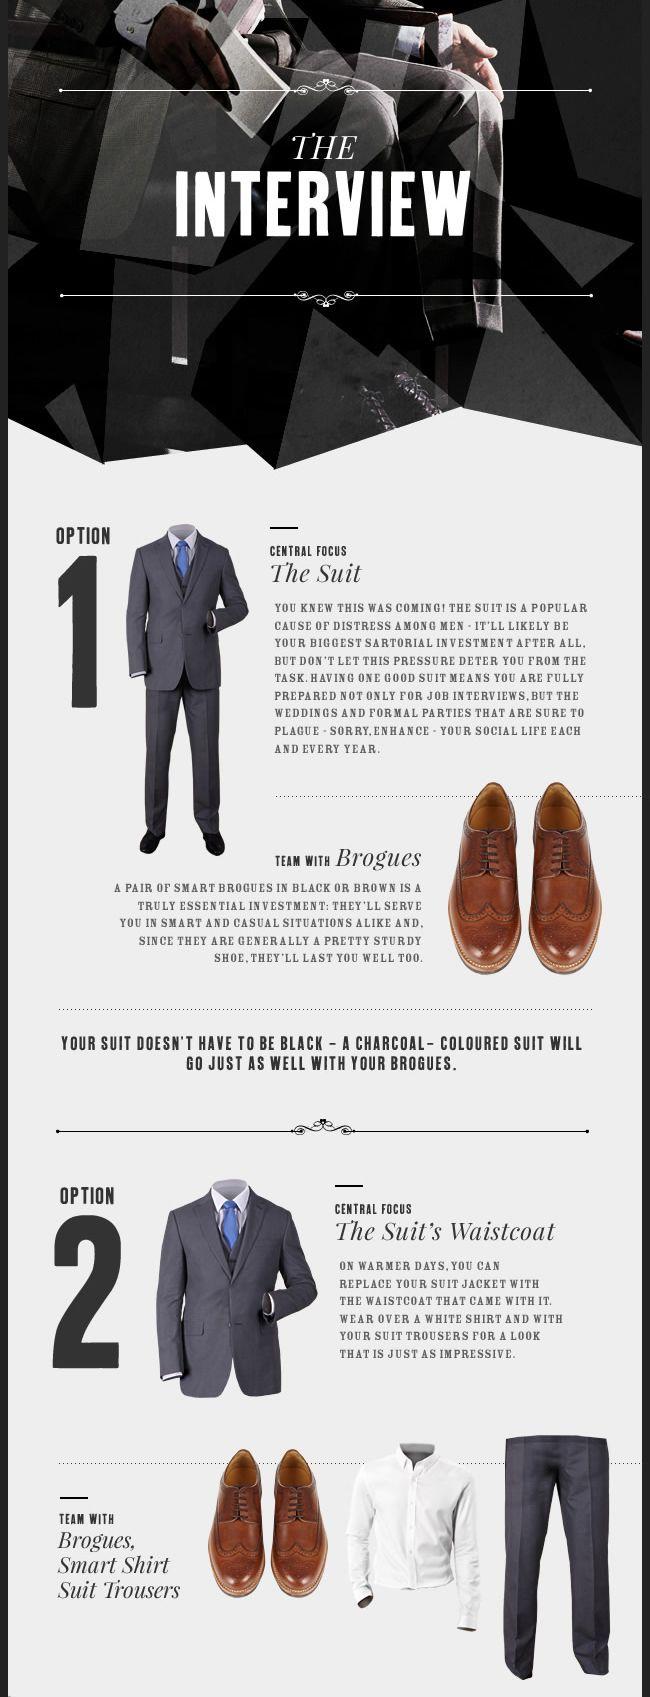 The Capsule Wardrobe | Men's must-have The Interview – Debenhams Blog